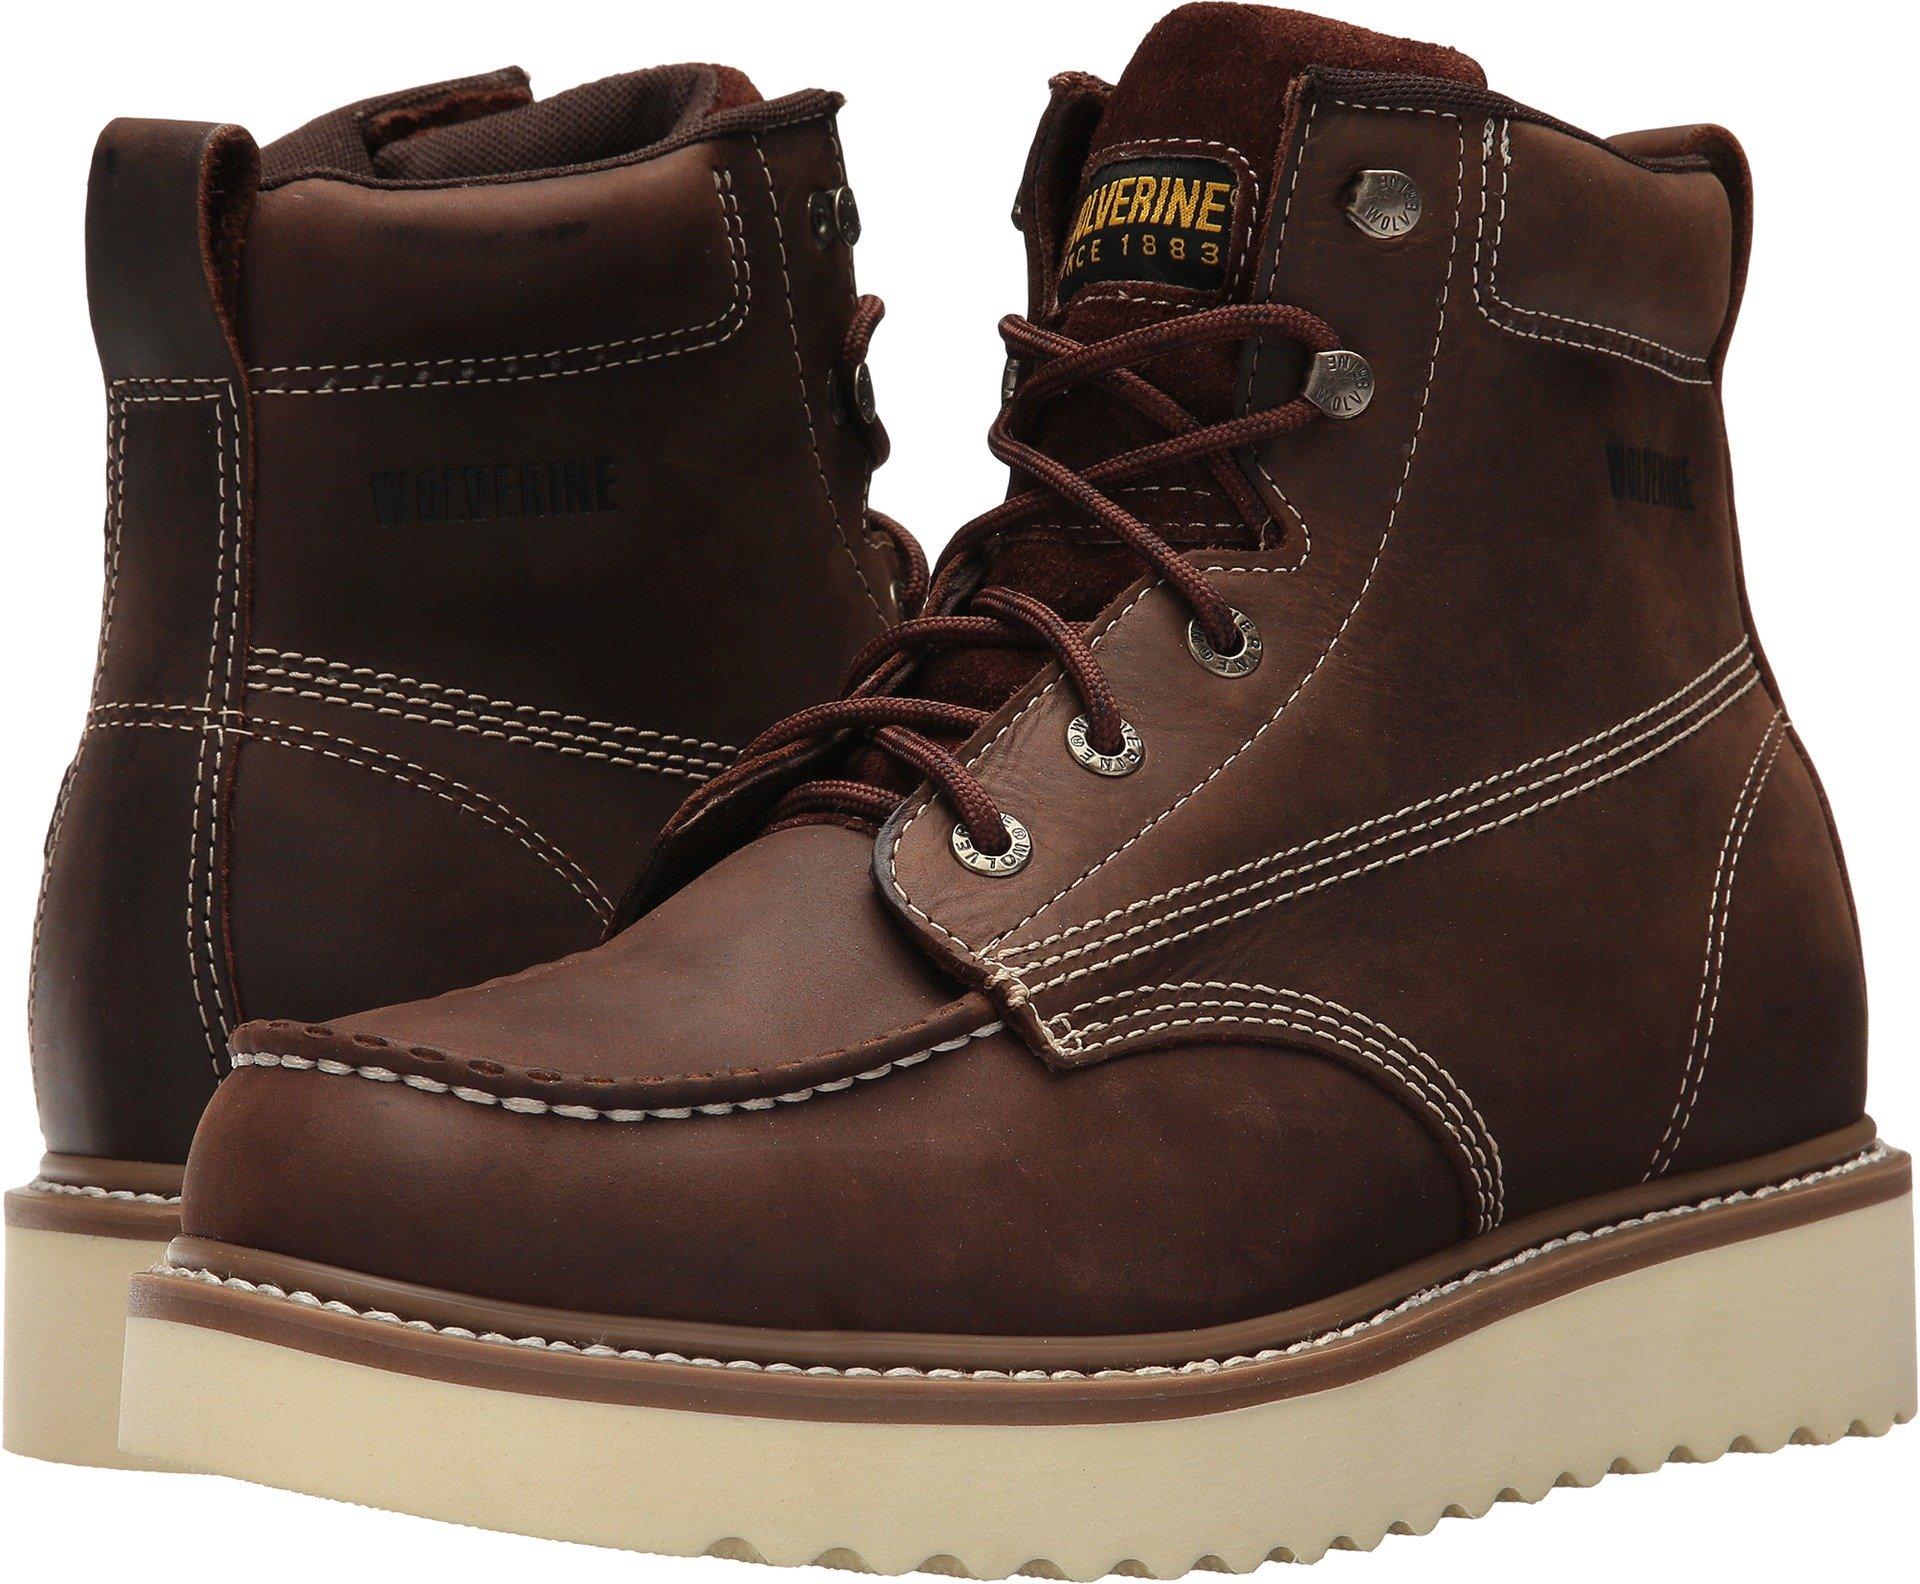 Wolverine Men's Loader 6'' Soft Toe Wedge Work Boot, Brown, 12 M US